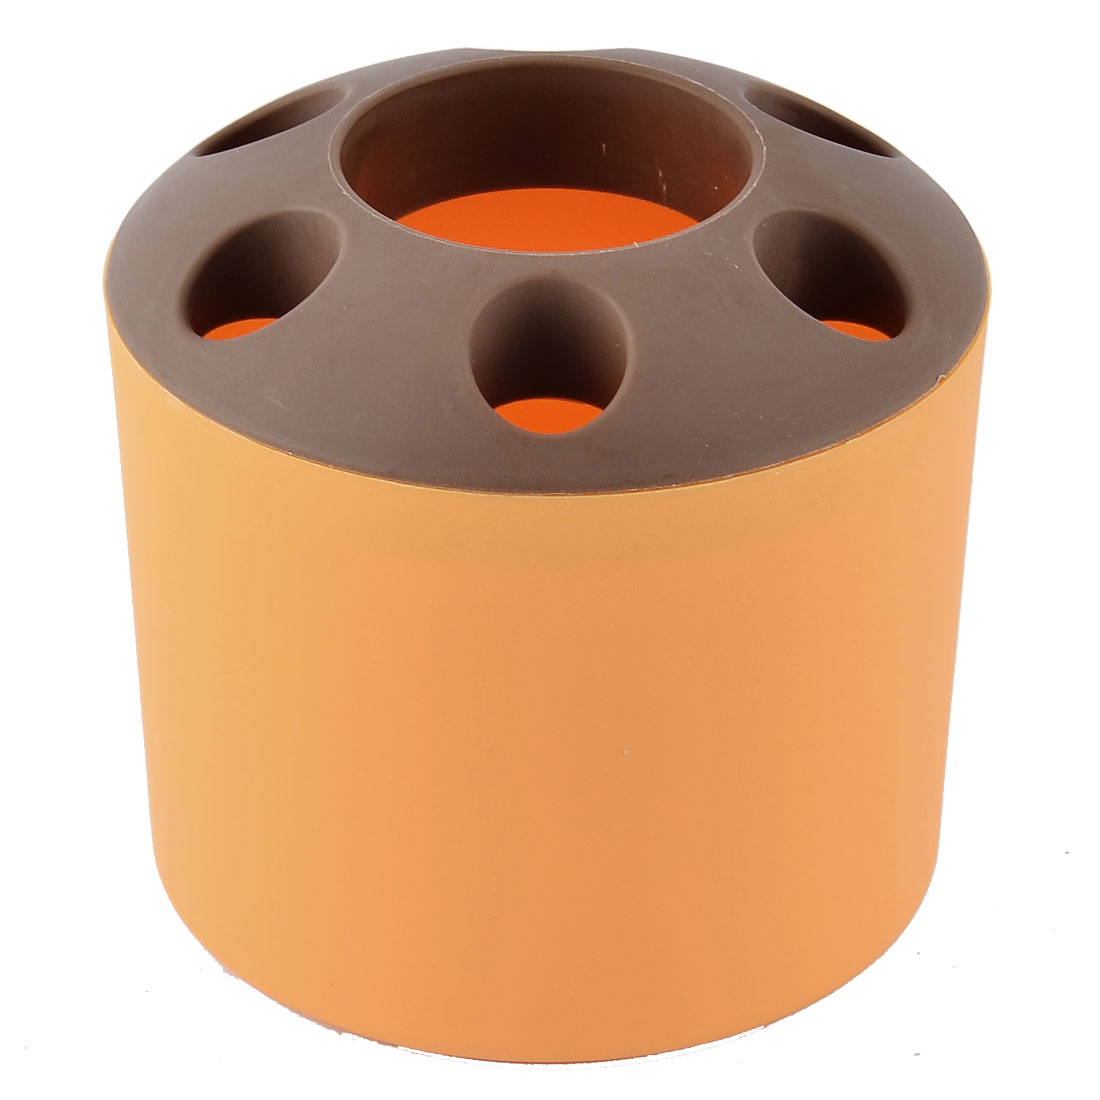 Bathroom Toothbrush Toothpaste Plastic Storage Organizer Holder Cup Orange